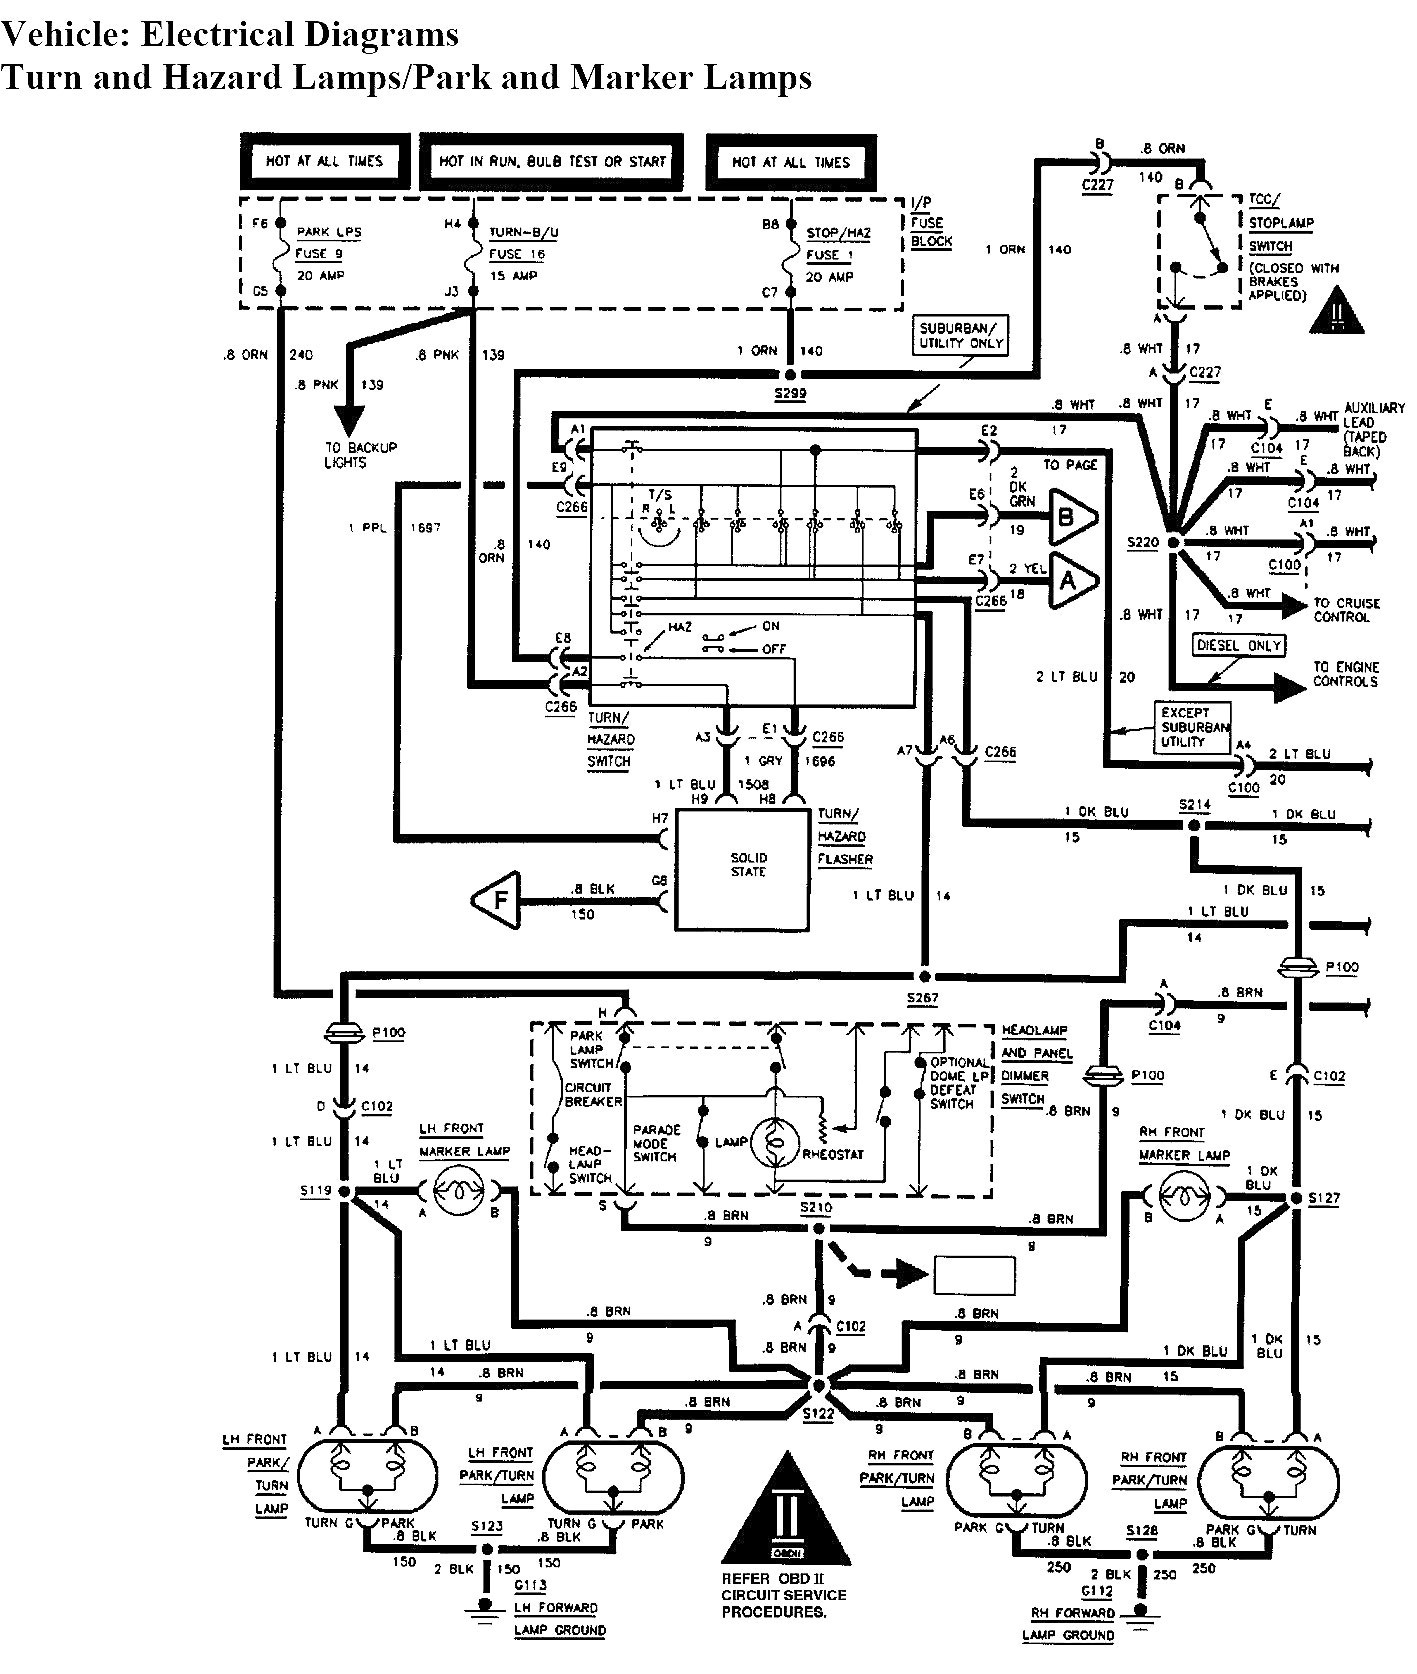 S10 tail light wiring diagram blazer trailer lights wiring diagram rh detoxicrecenze